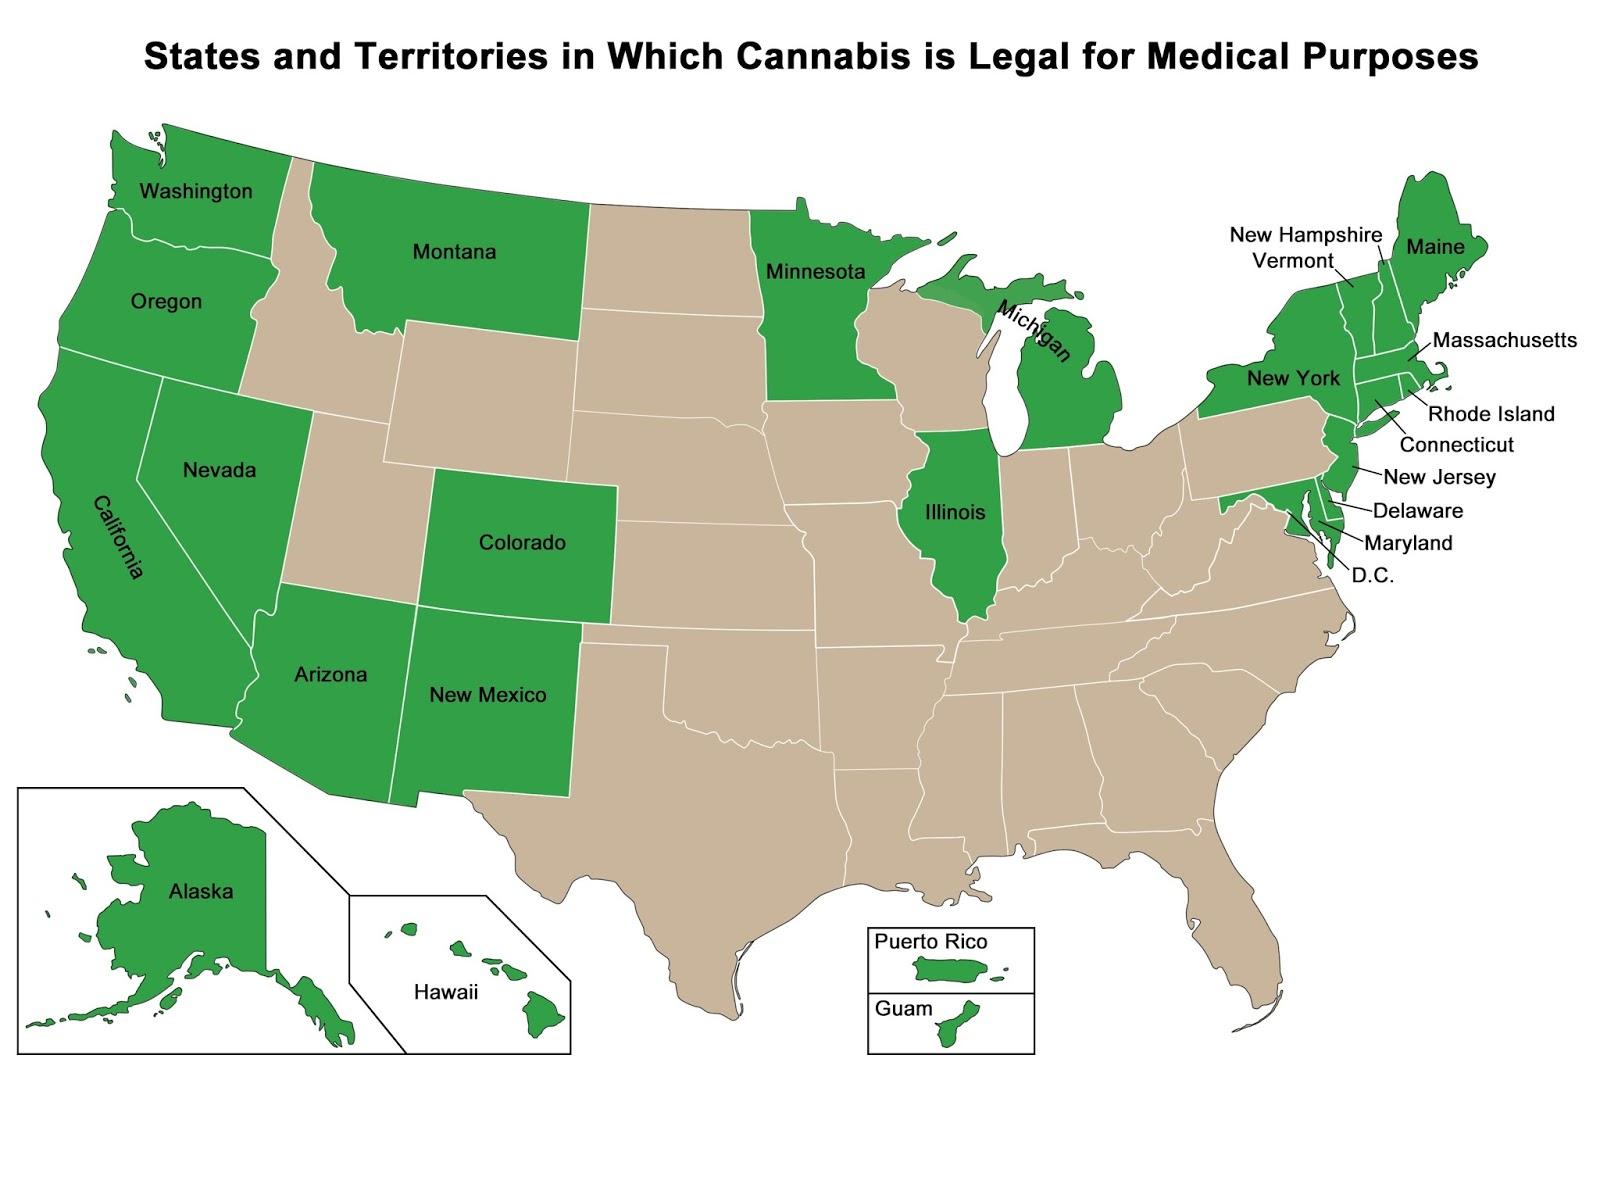 20 Medical Benefits of Marijuana You Probably Never Knew